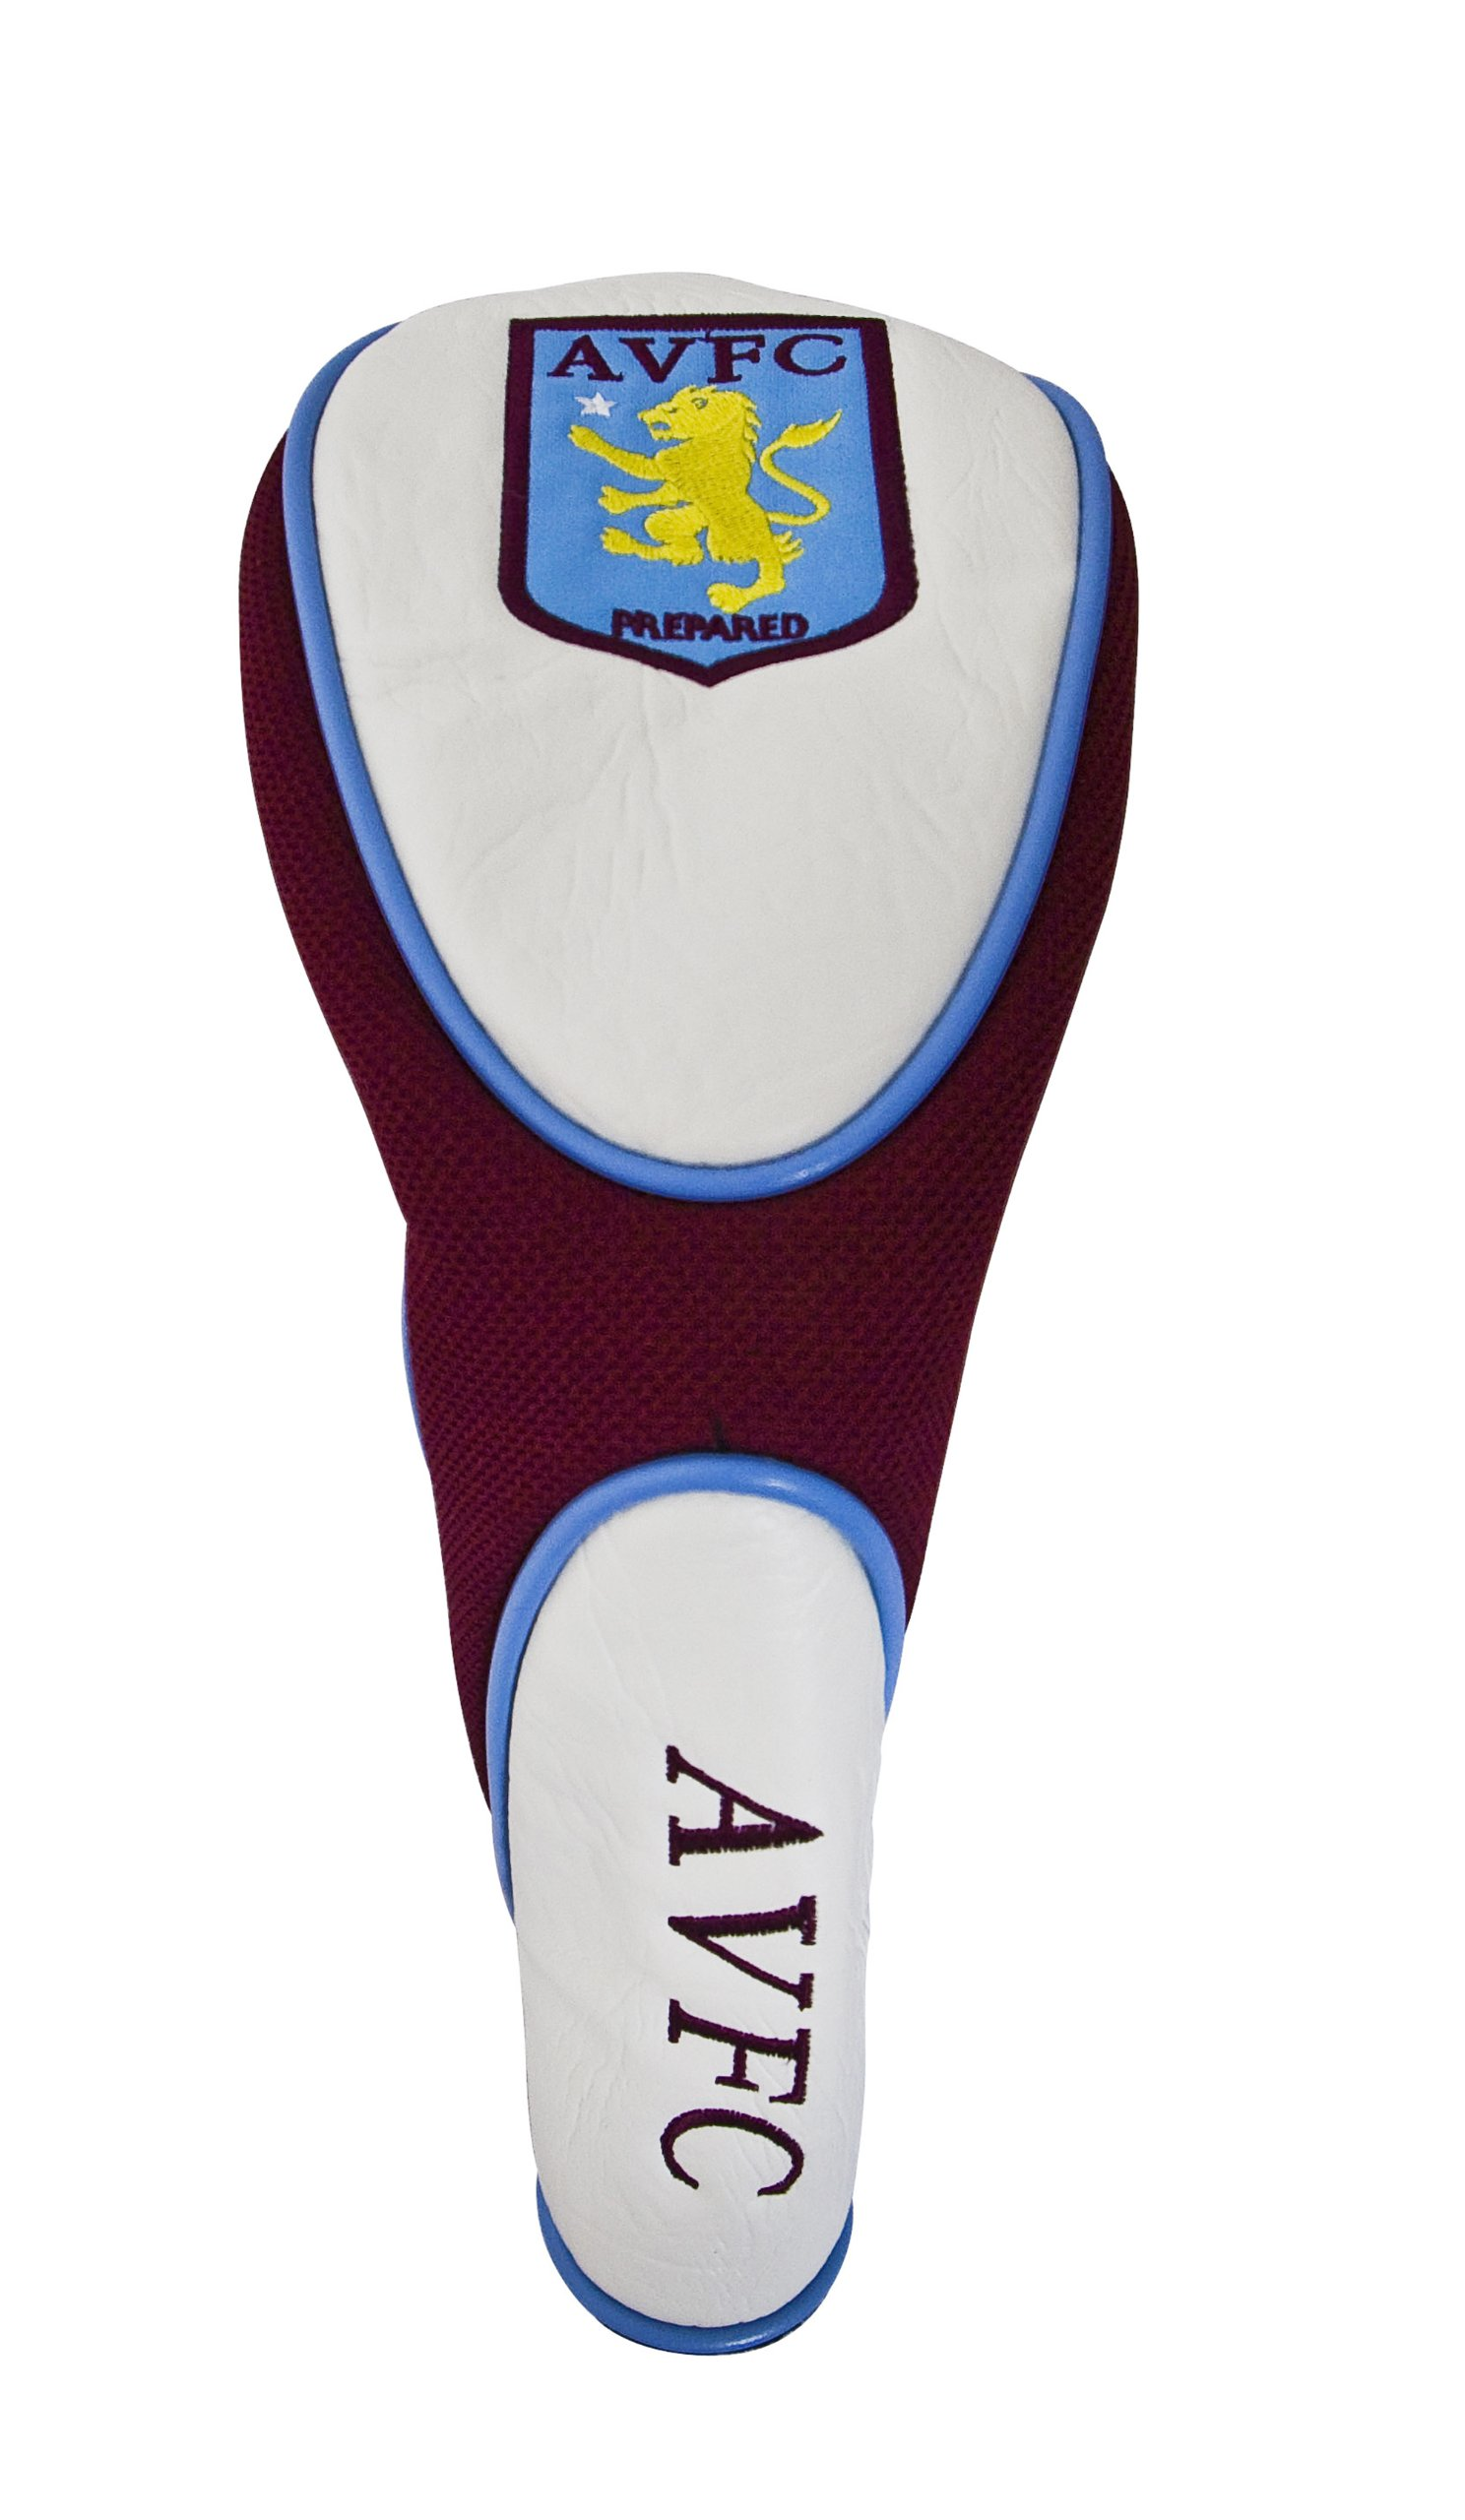 Aston Villa Football Club Golf Headcover Extreme Fairway Golf Accessories by Aston Villa F.C.